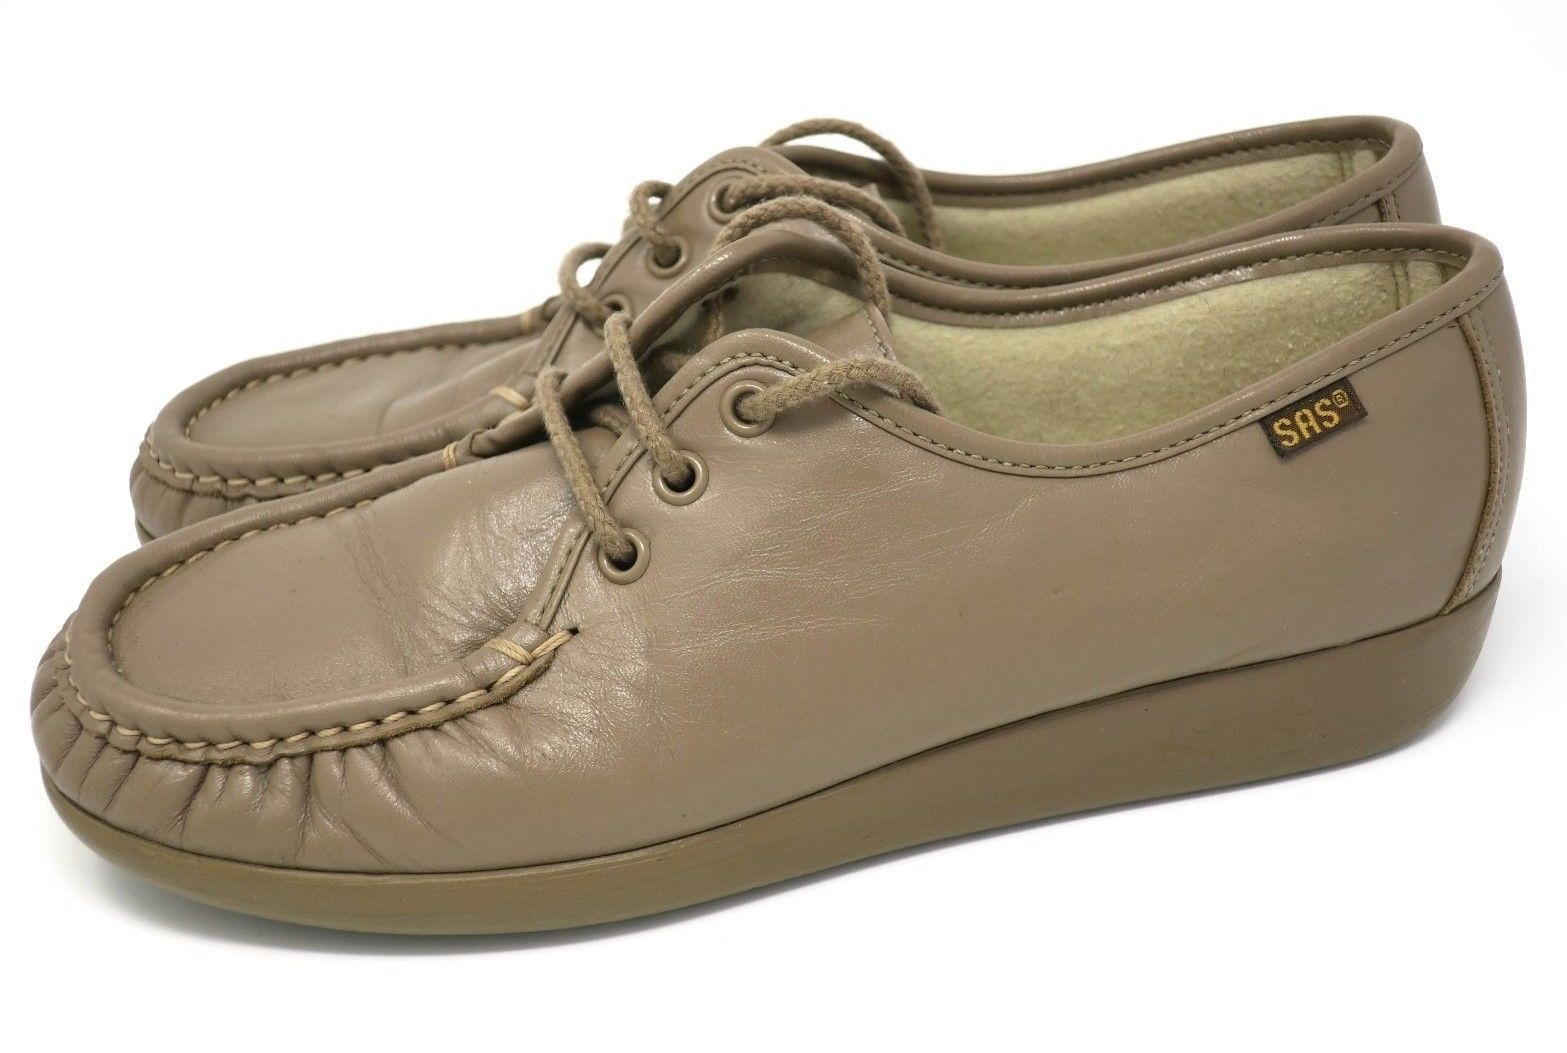 3fef78c82a 57. 57. SAS Siesta Mocha Comfort Lace Up Orthopedic Moccasin Walking Shoes  Women's 7.5M · SAS Siesta Mocha Comfort Lace Up ...